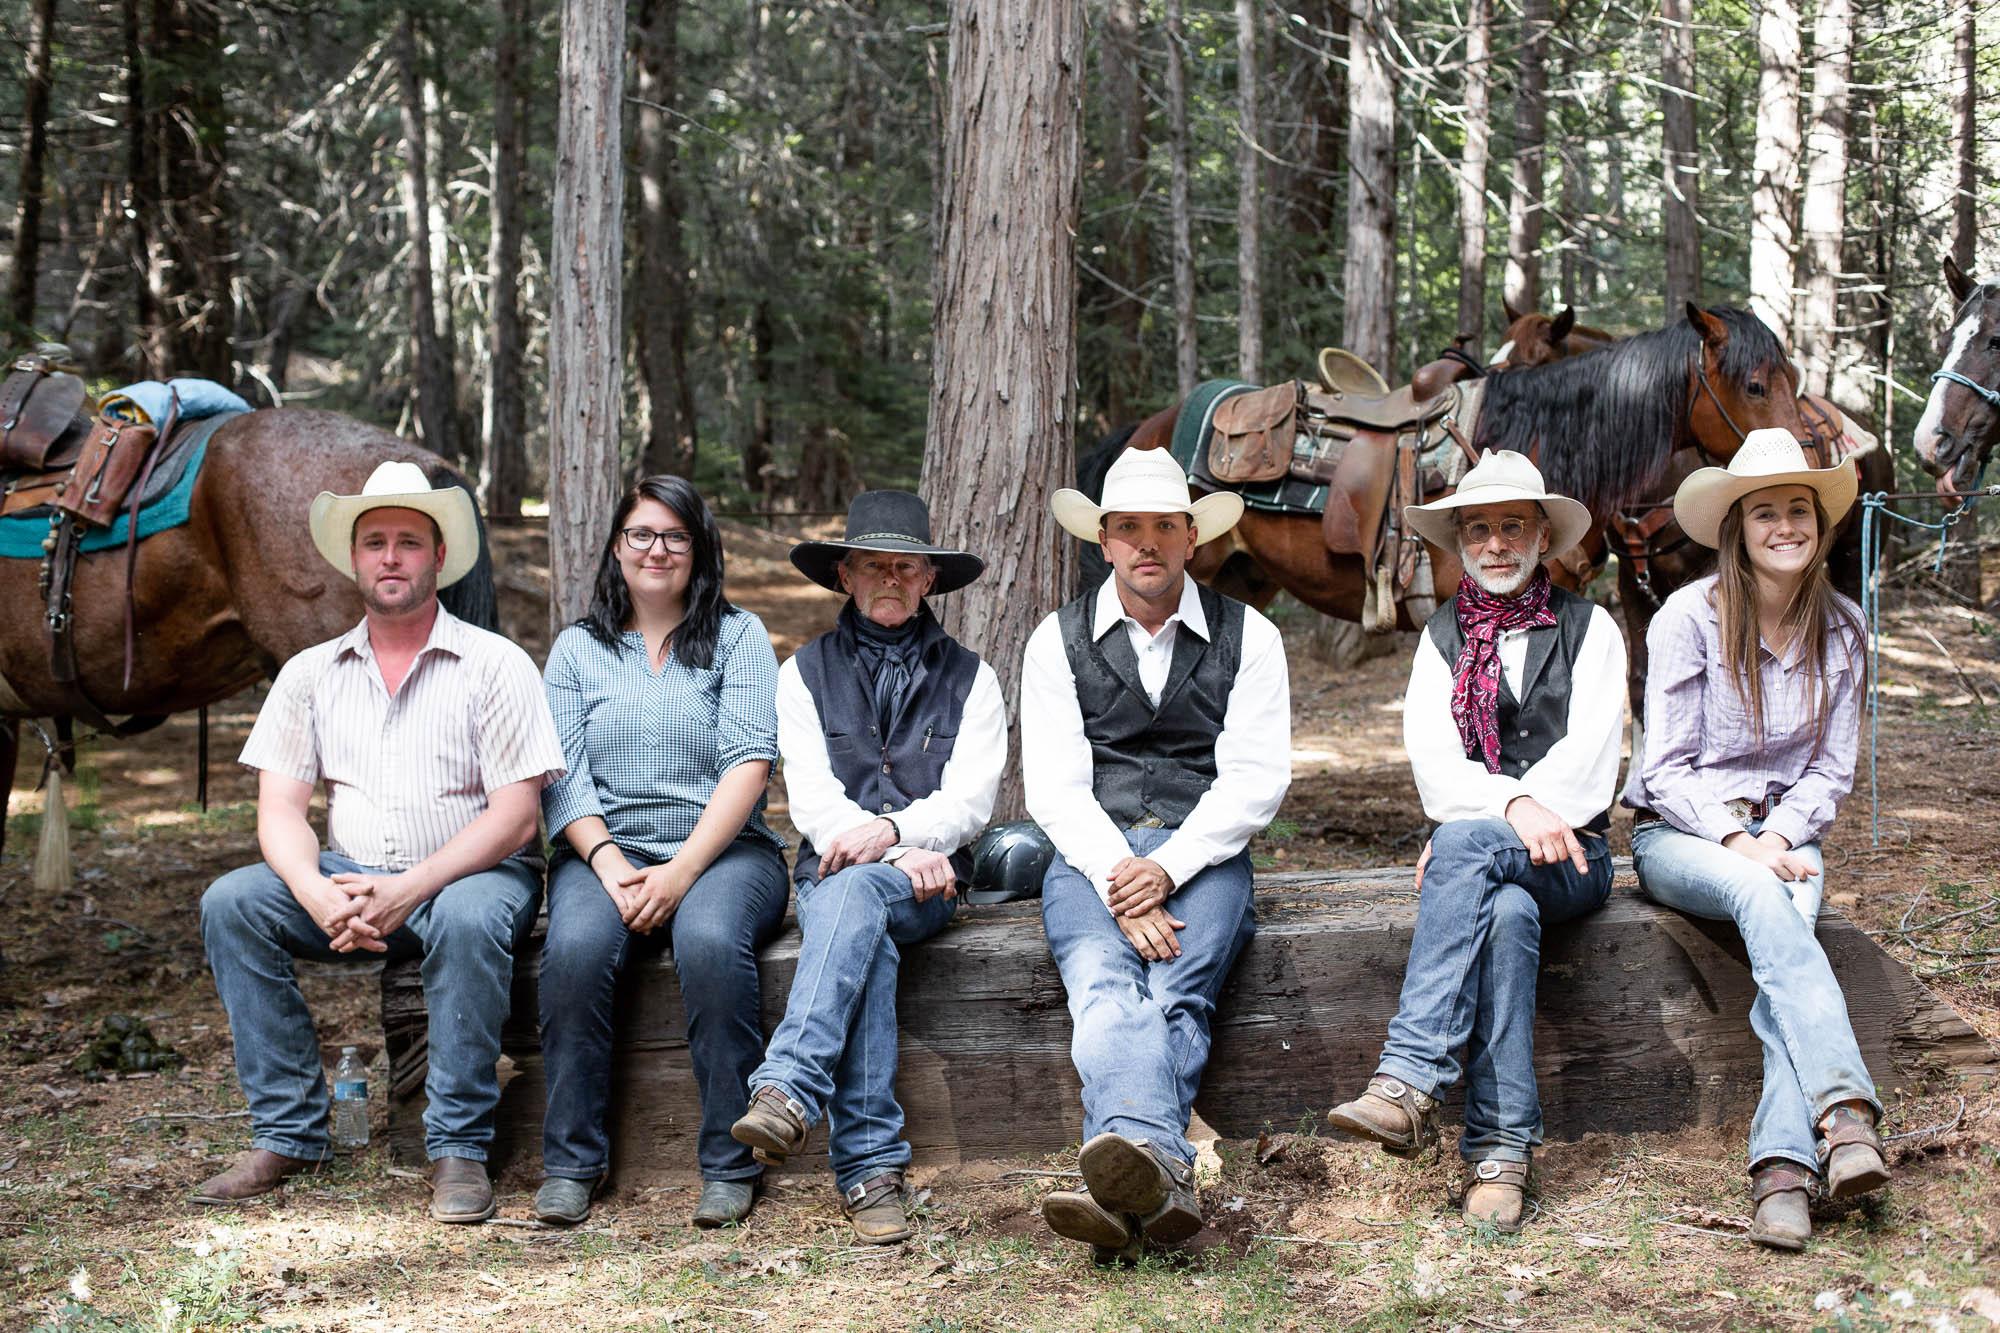 Greenhorn Ranch Wranglers help beginner riders